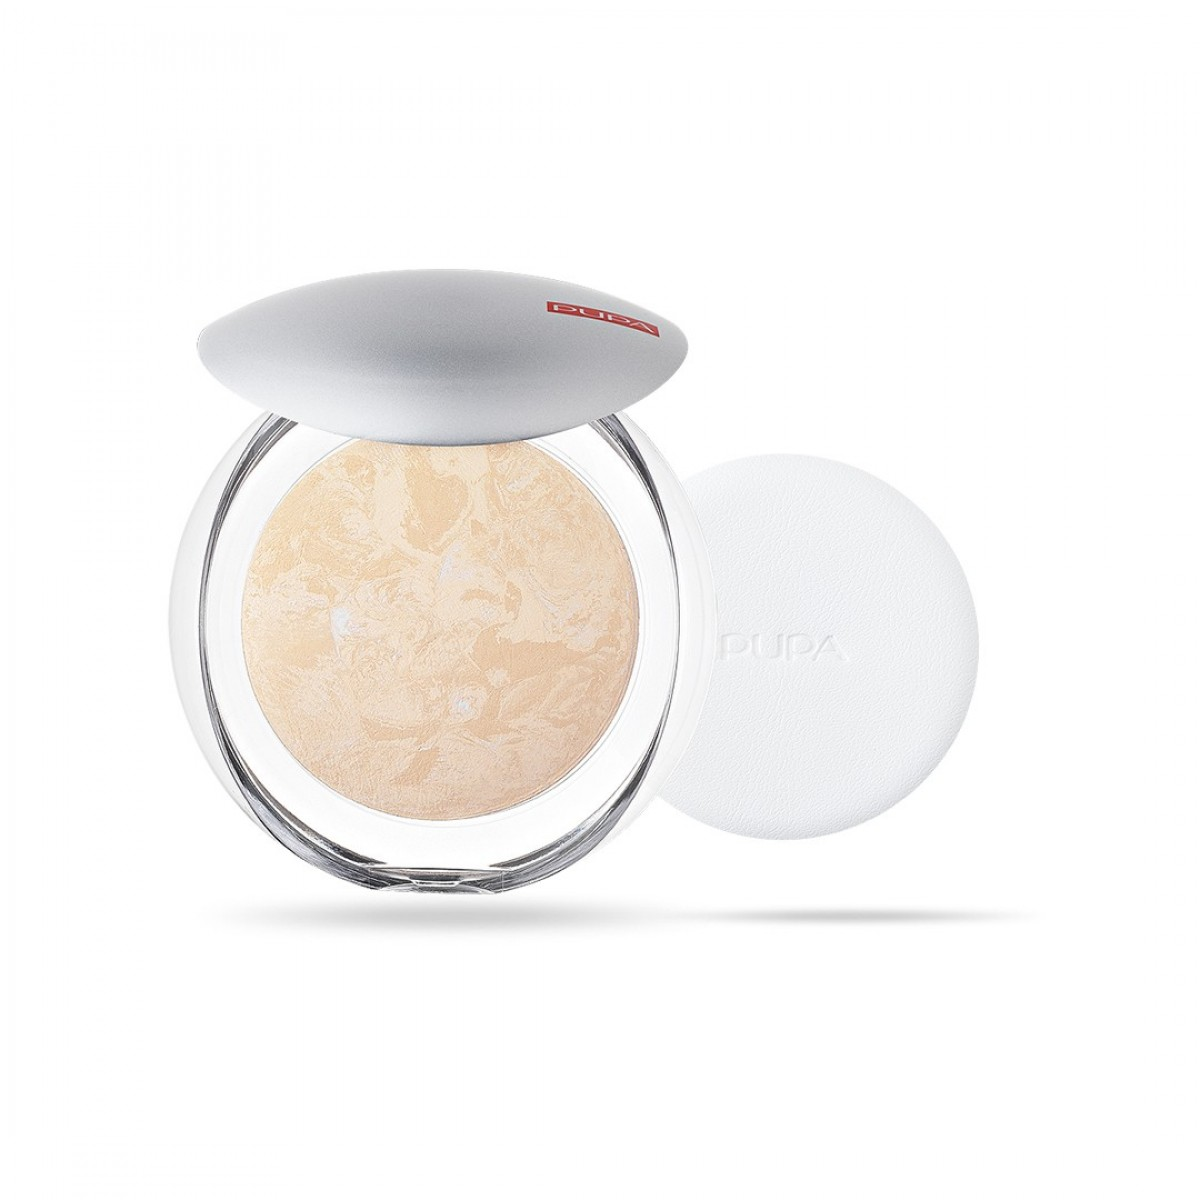 Luminys Baked Face Powder